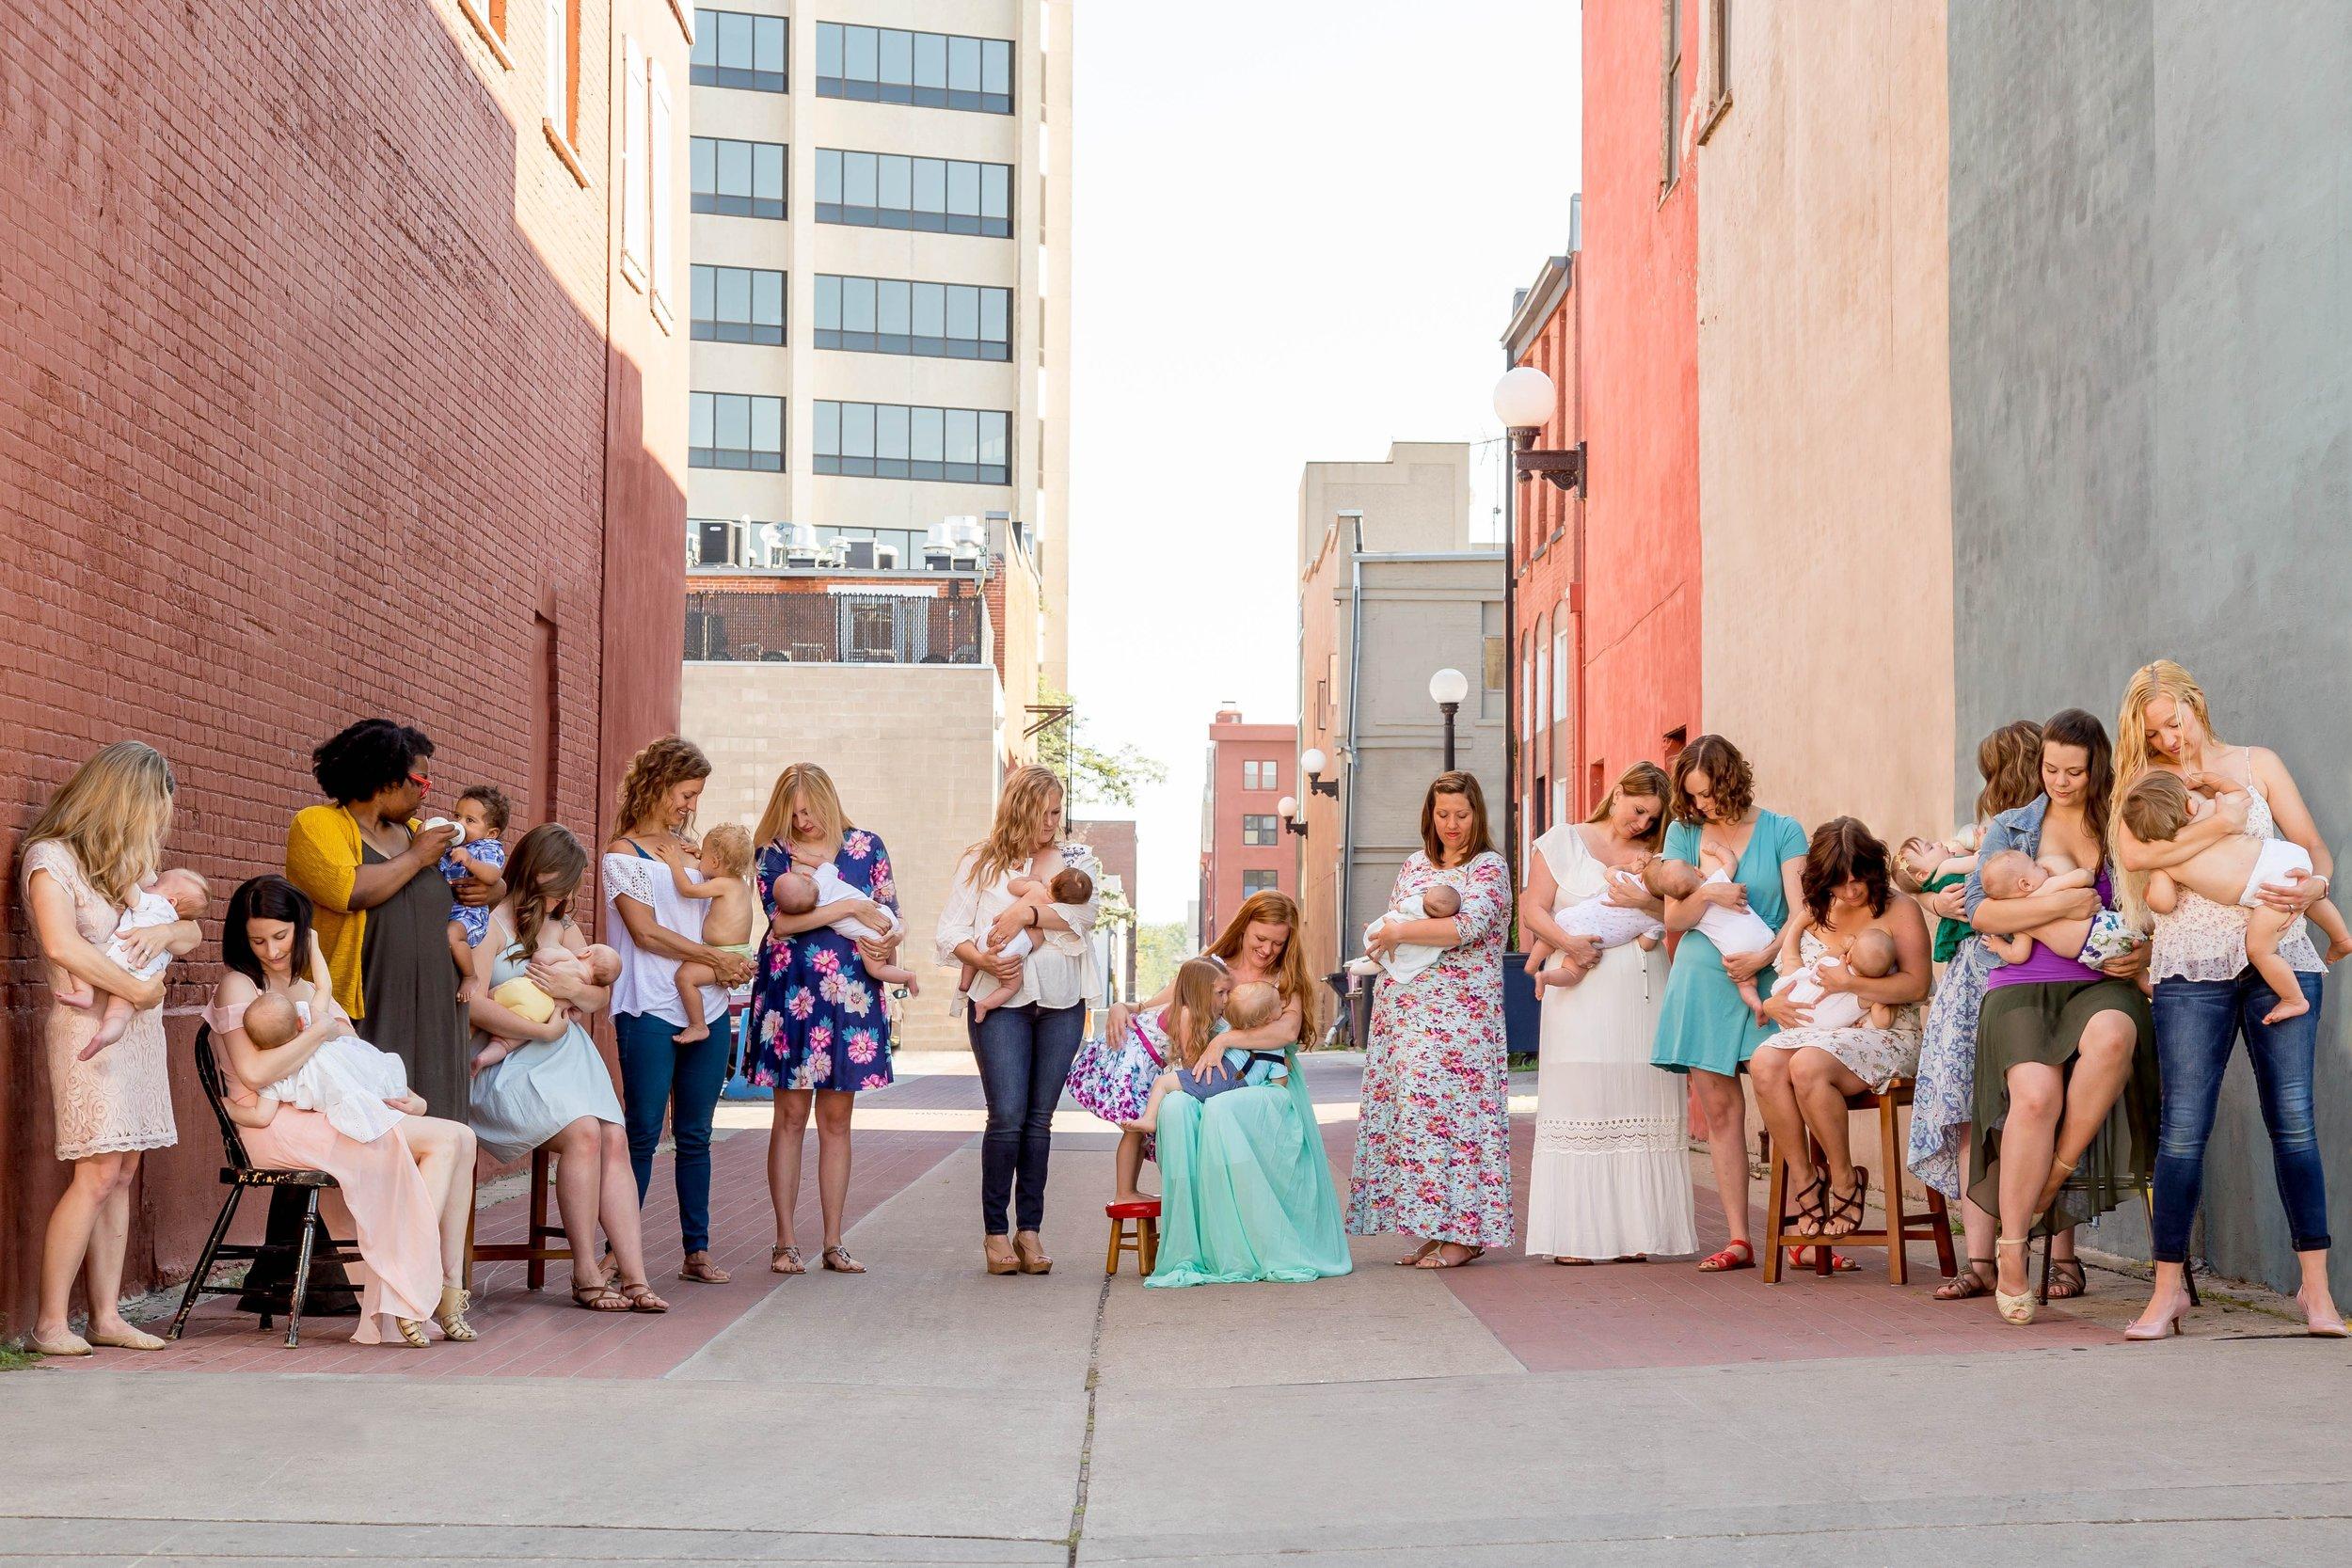 Normalize Breastfeeding 2017-5131-2.2.jpg